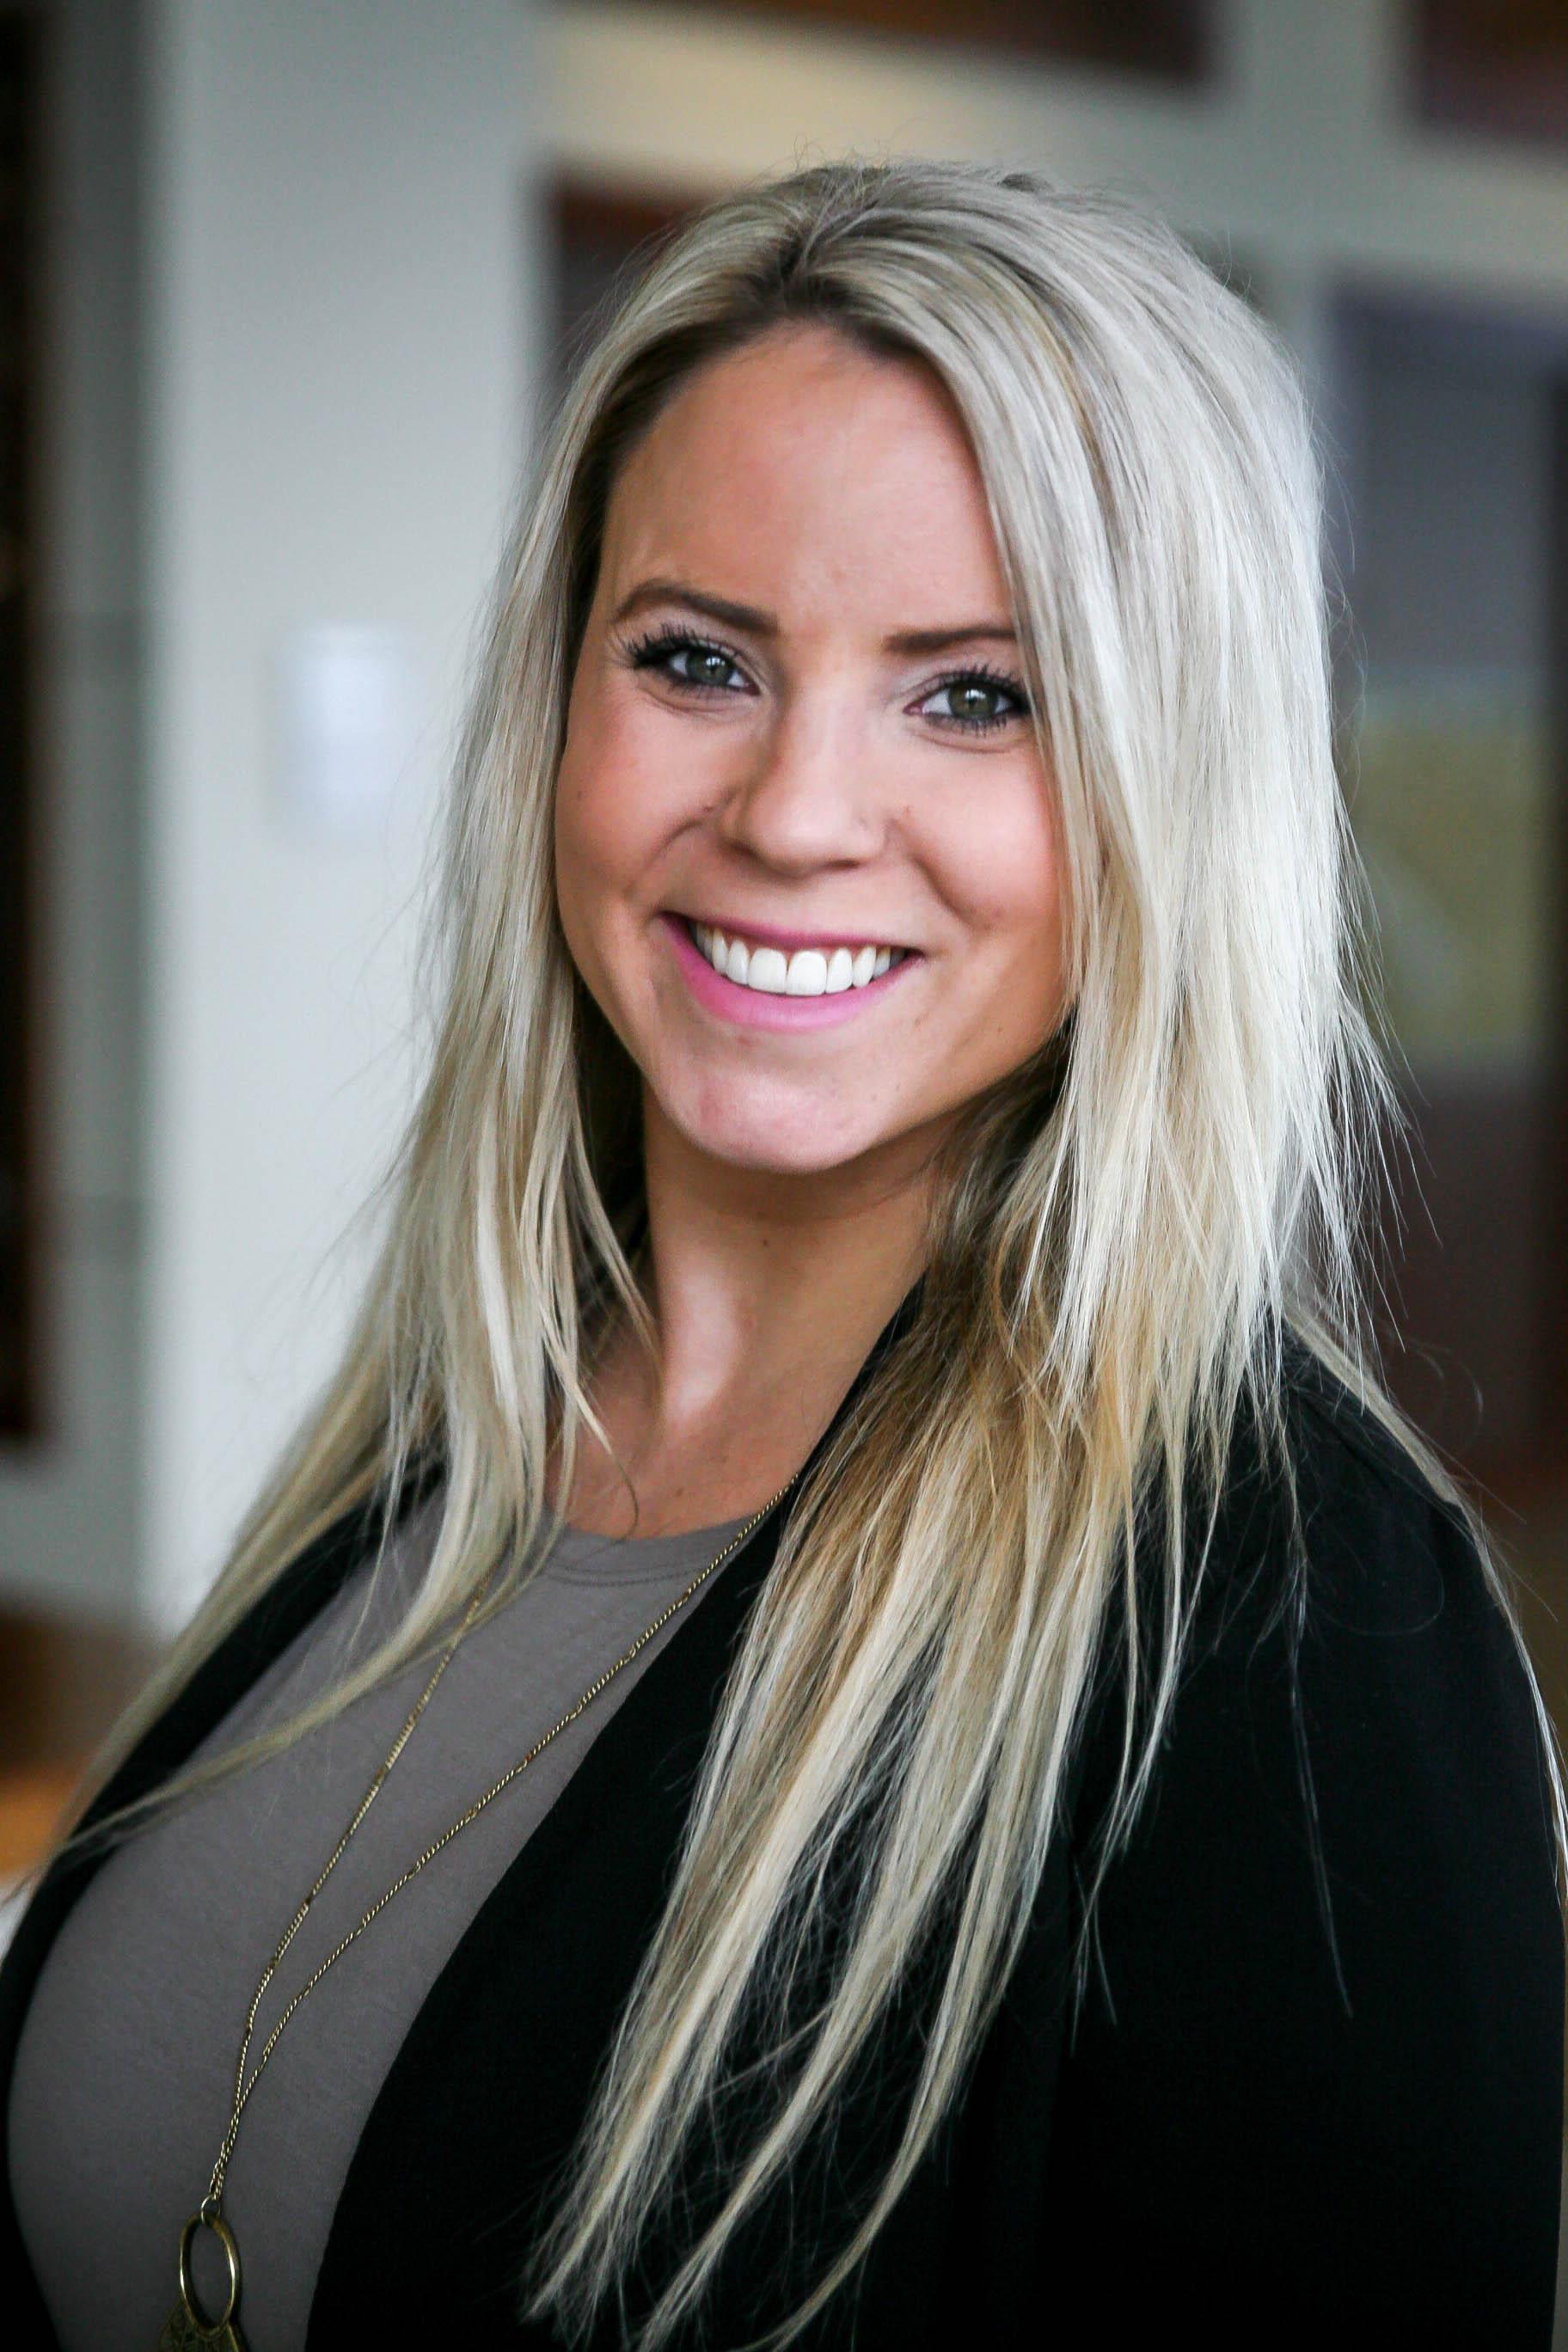 Kendall Leslie